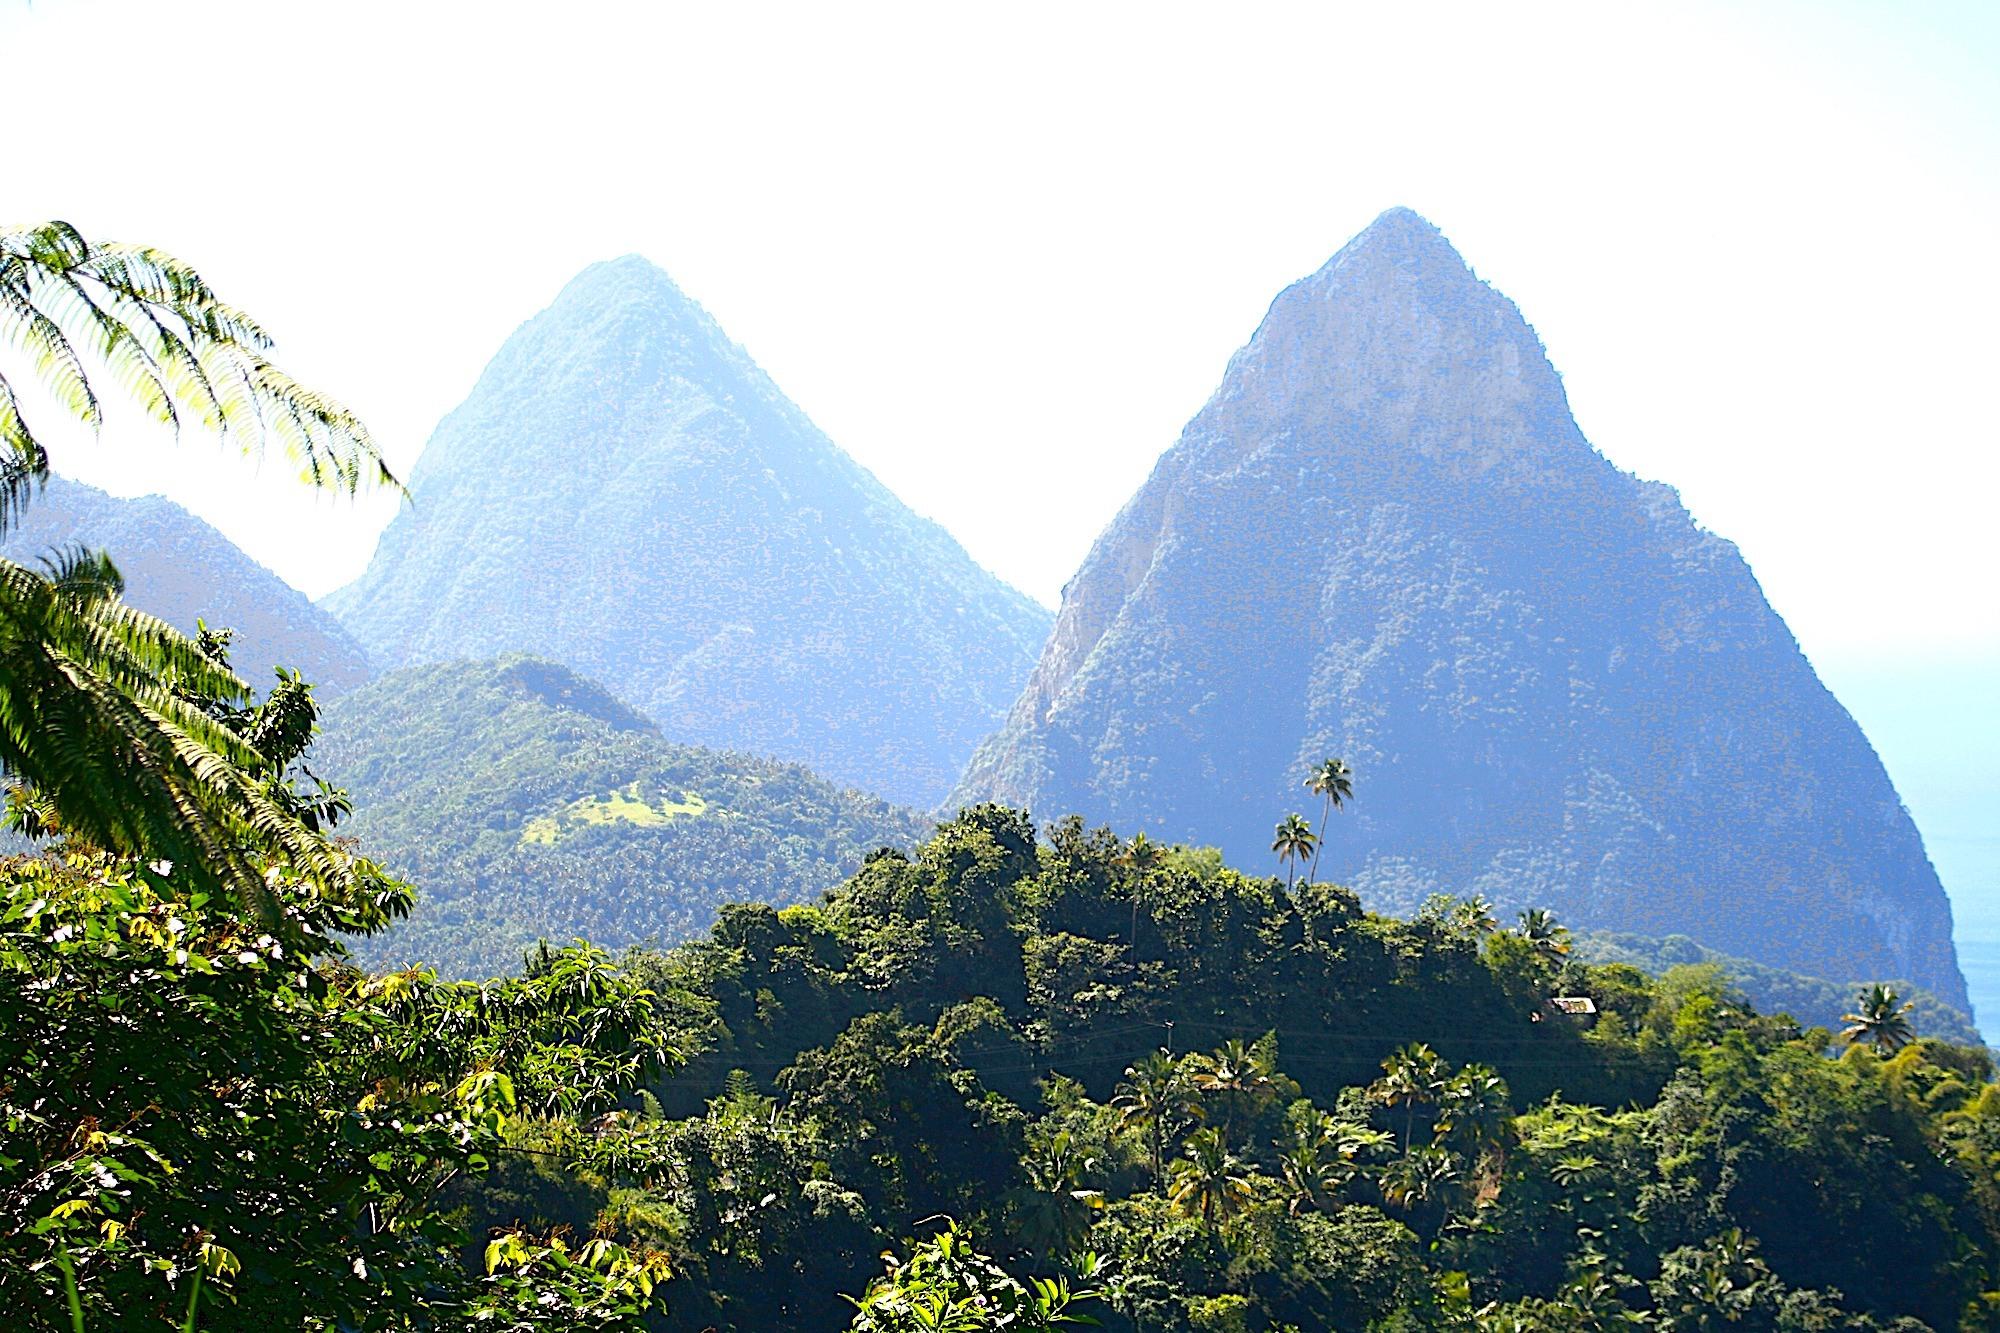 St. Lucia Mountains